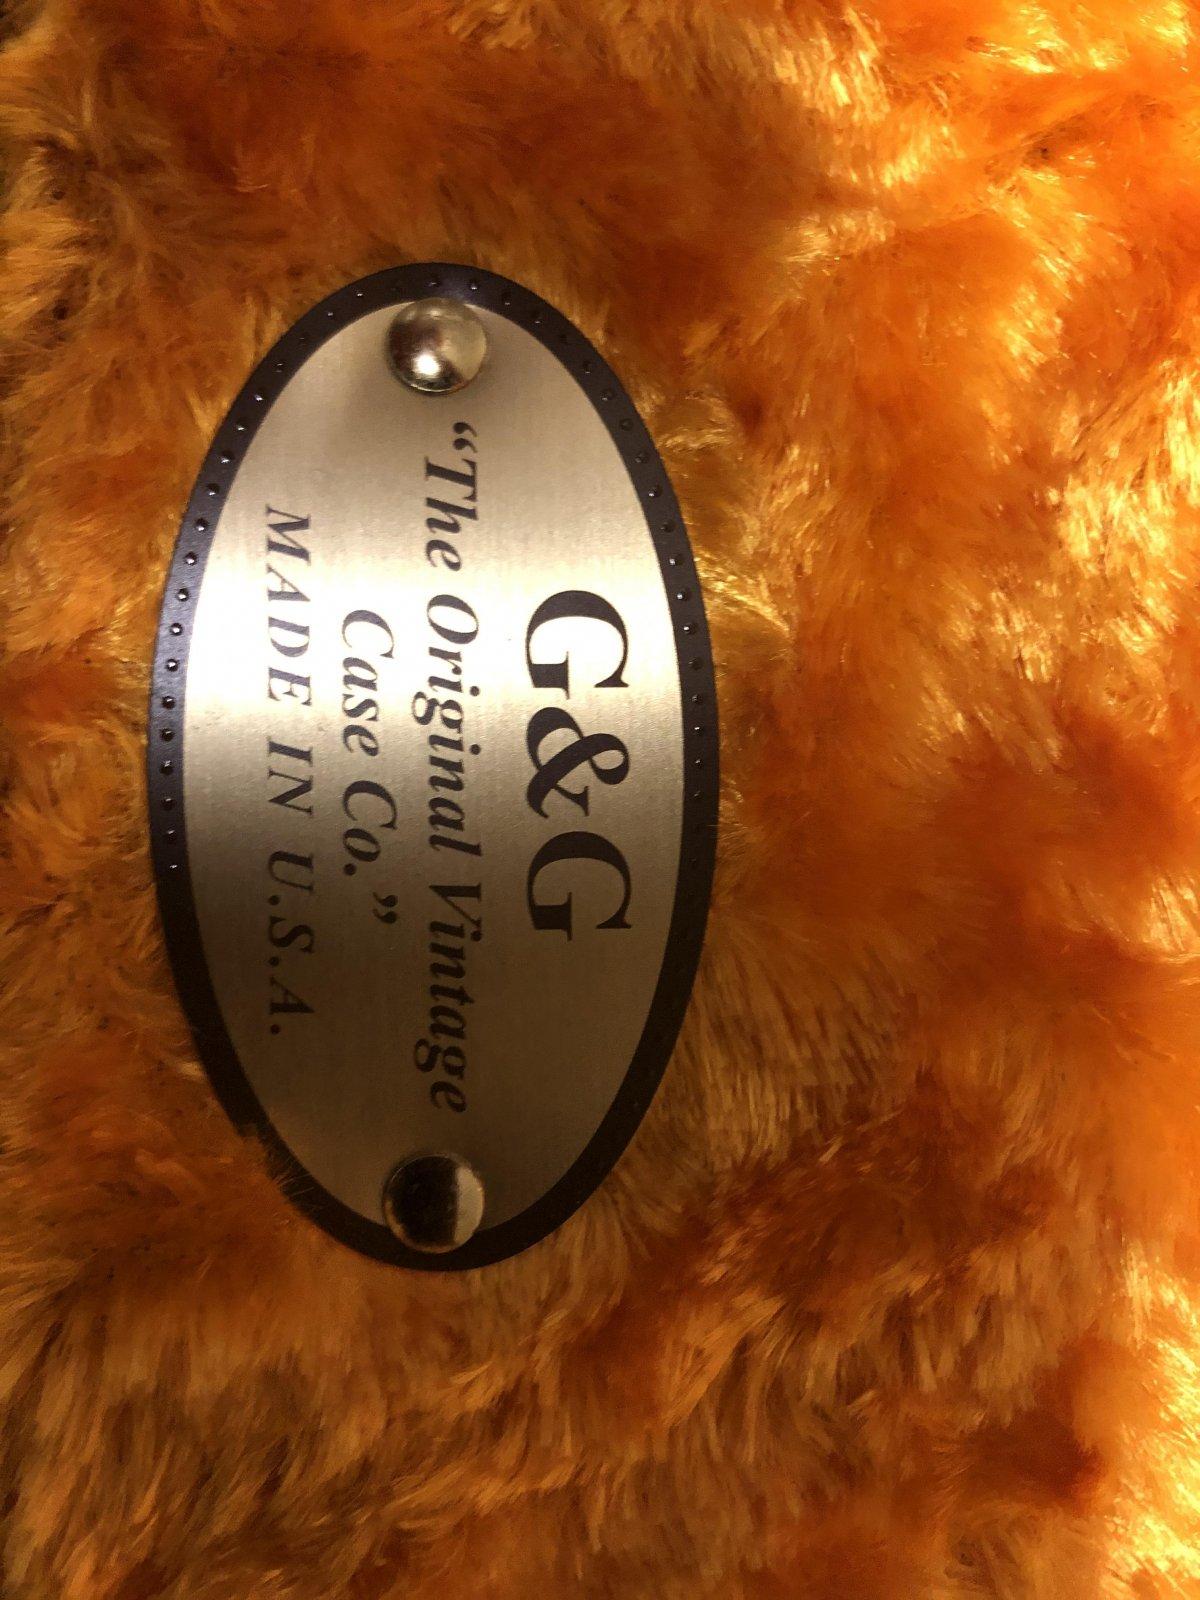 G&G Deluxe Jaguar /Jazzmaster /Toronado /Jagmaster  Hardshell Case Brown with Gold Plush Interior (USED)